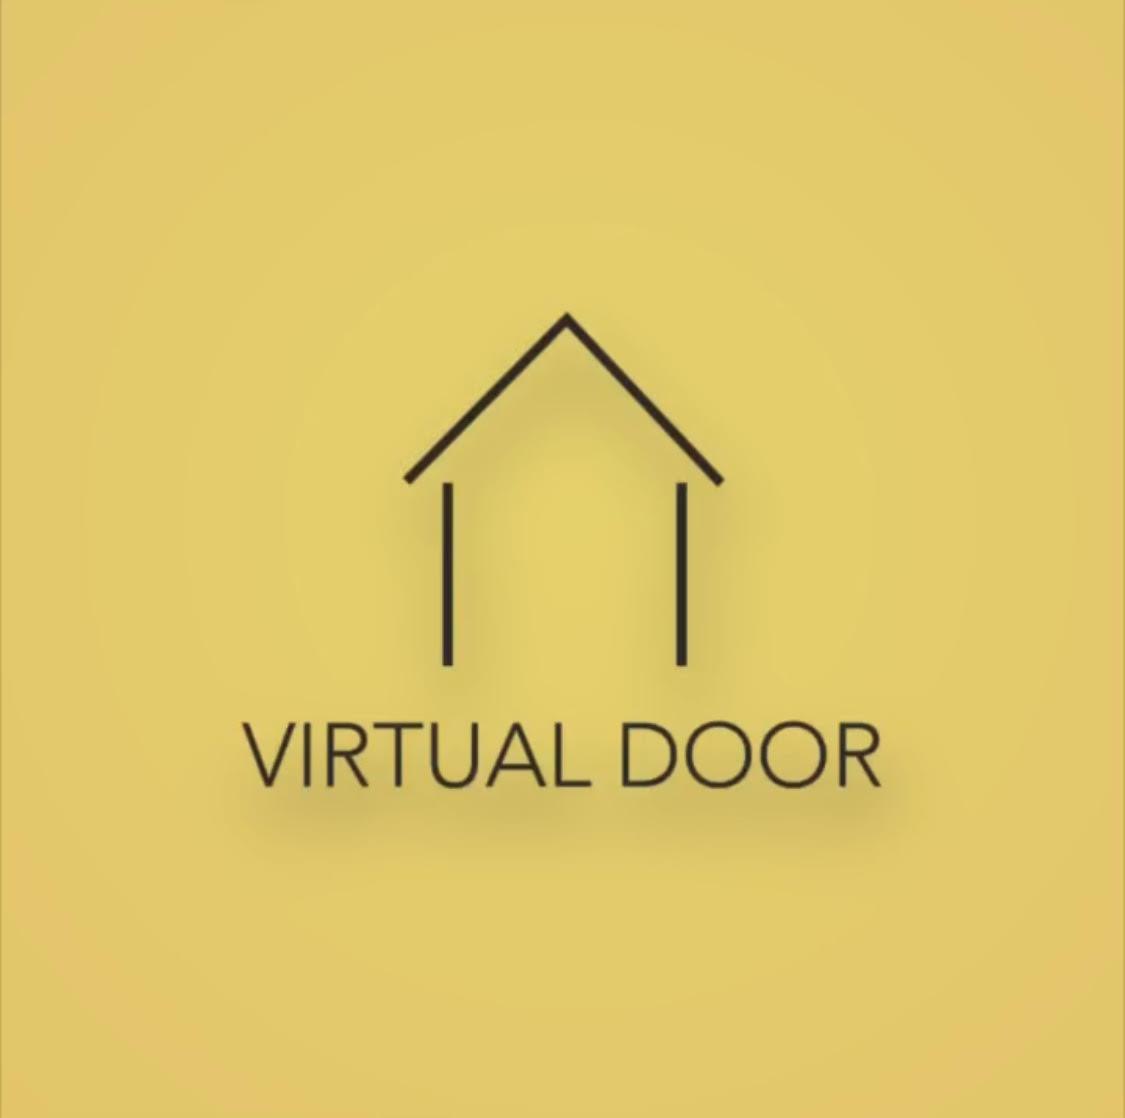 Virtual Door Limited